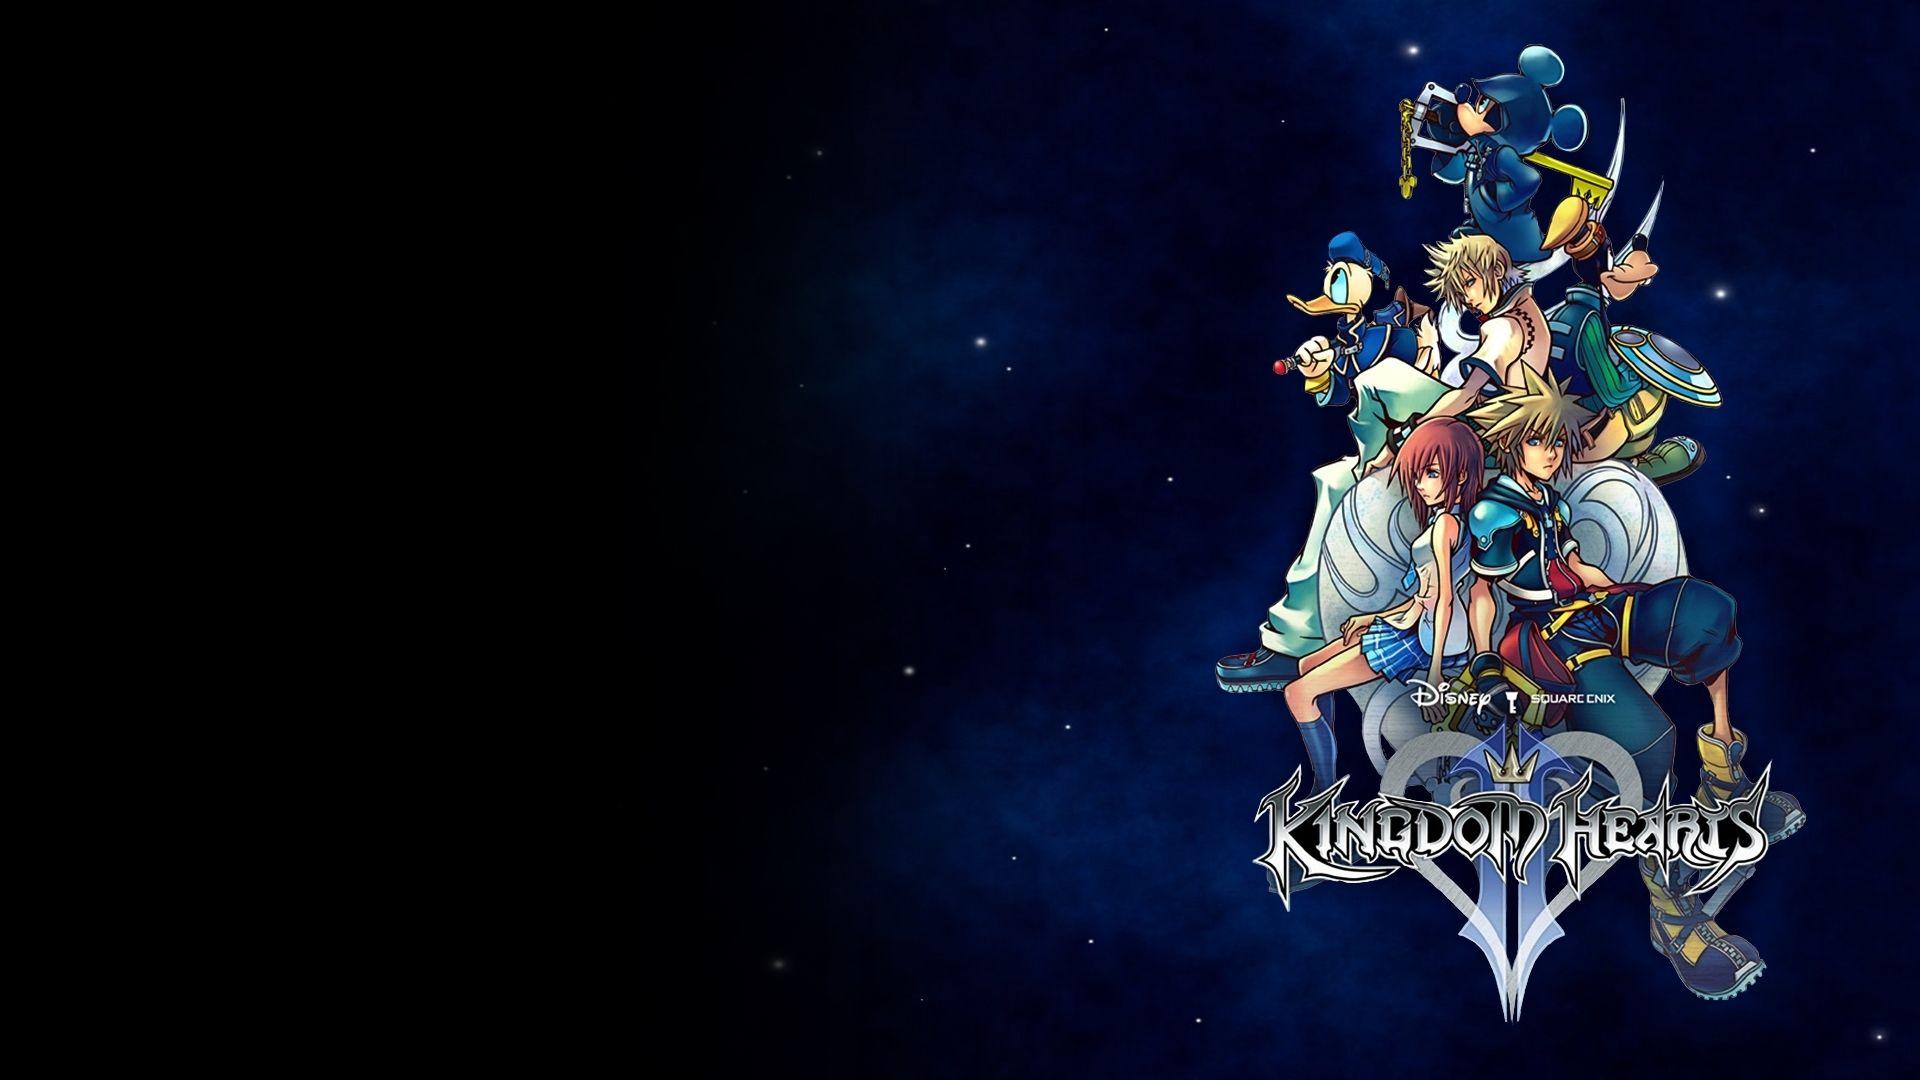 10 New Kingdom Hearts Desktop Backgrounds Hd Full Hd 1080p For Pc Background In 2020 Kingdom Hearts Wallpaper Heart Wallpaper Hd Heart Wallpaper